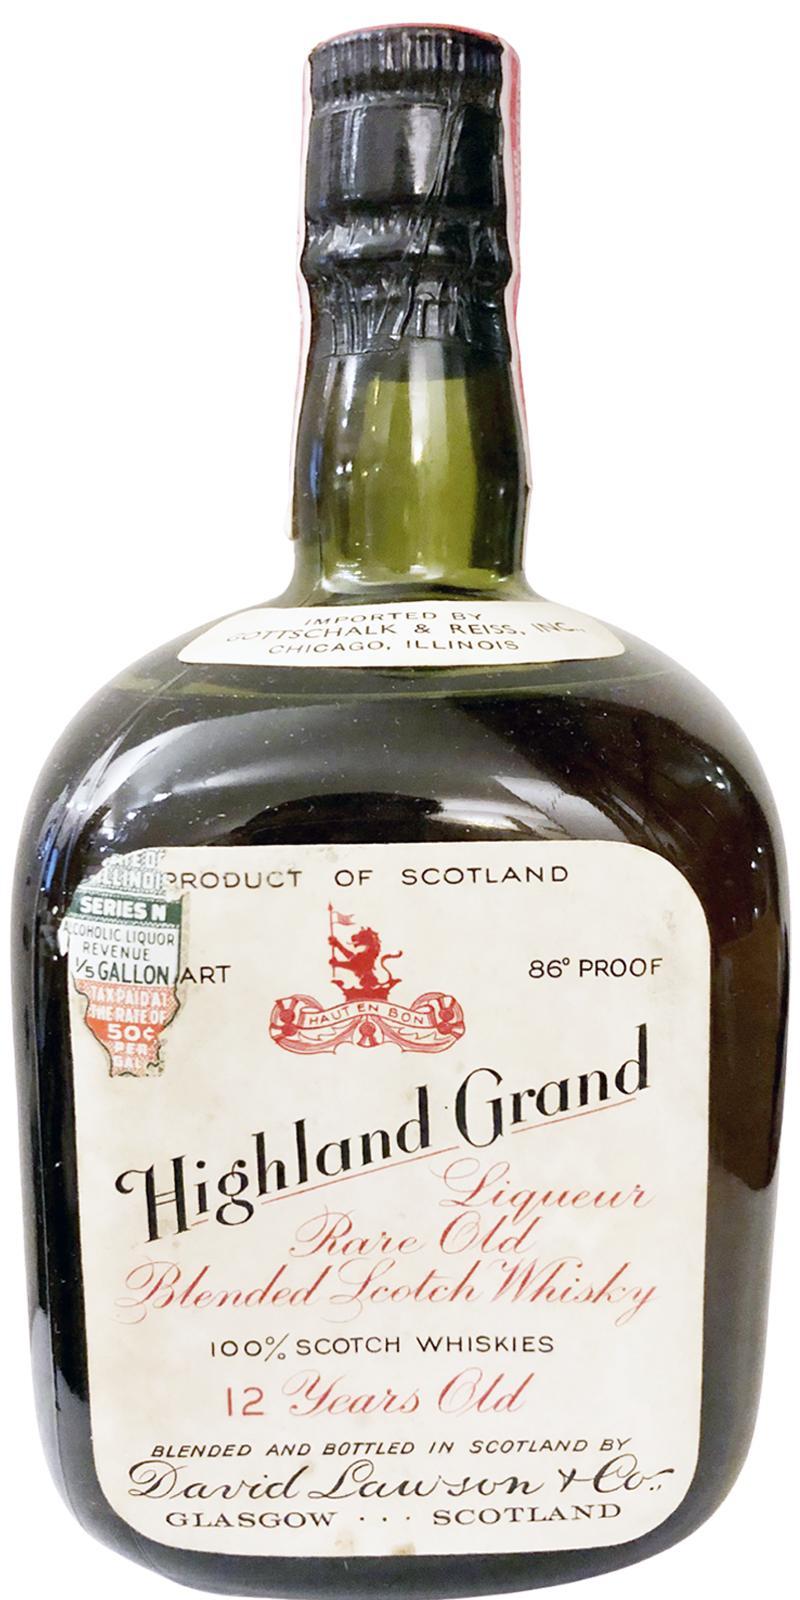 Highland Grand 12-year-old